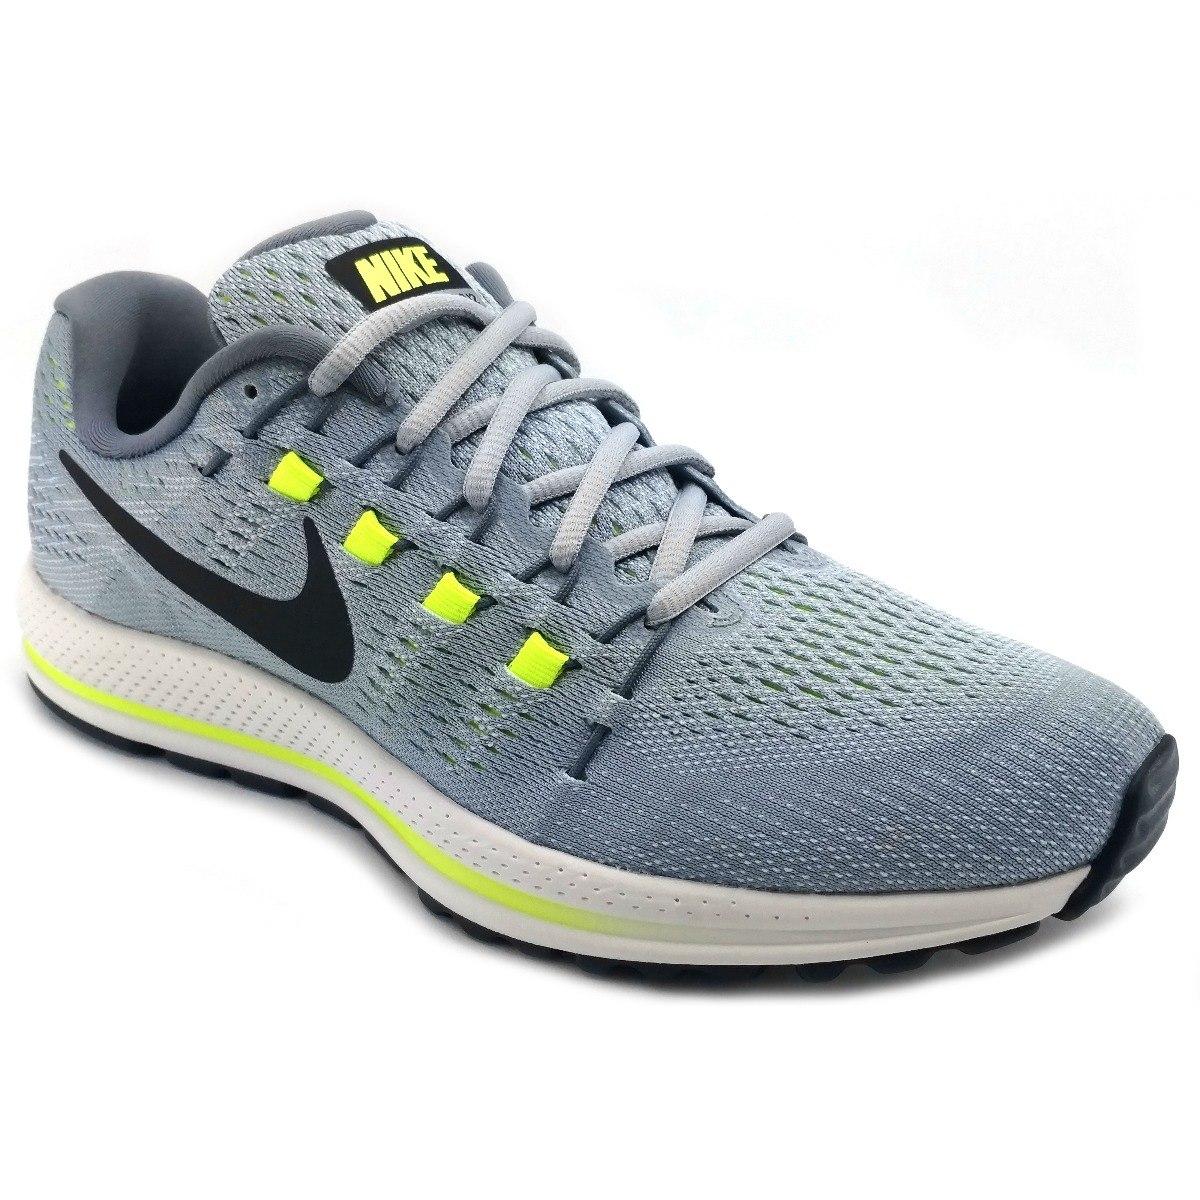 e2f14b1cf67 tenis nike zoom vomero 12 gris verde correr running. Cargando zoom.